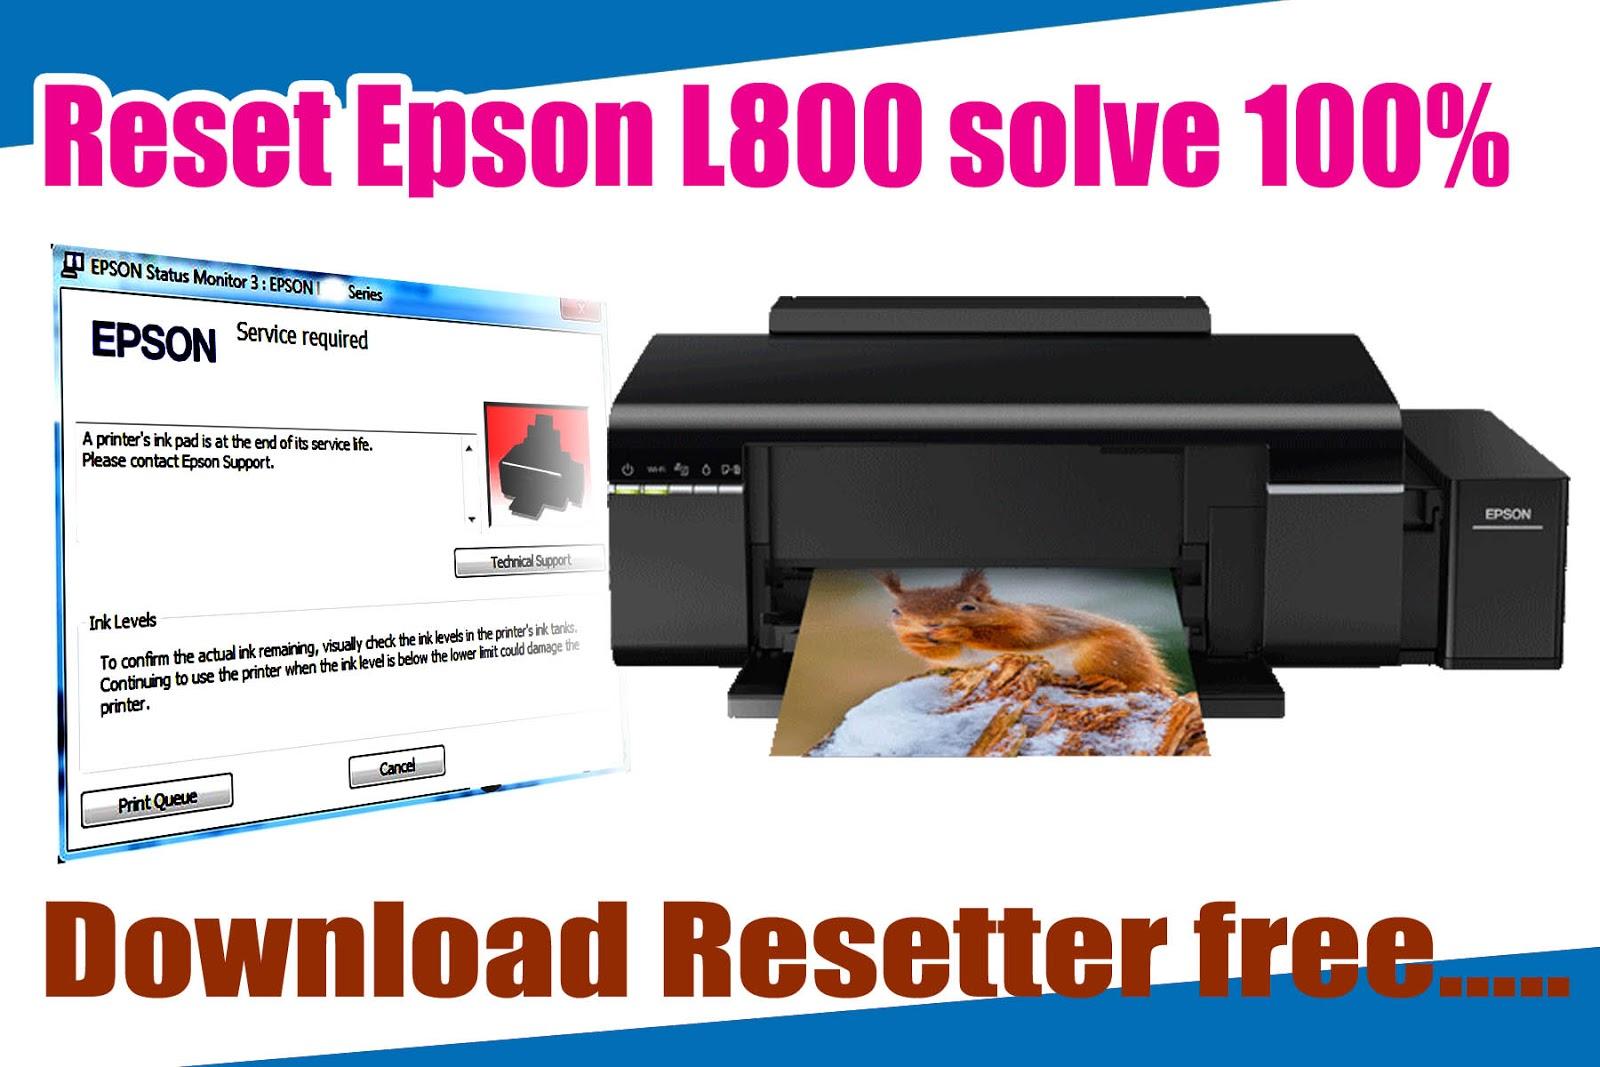 Reset Epson L800 with Adjustment Program (Solve a printer